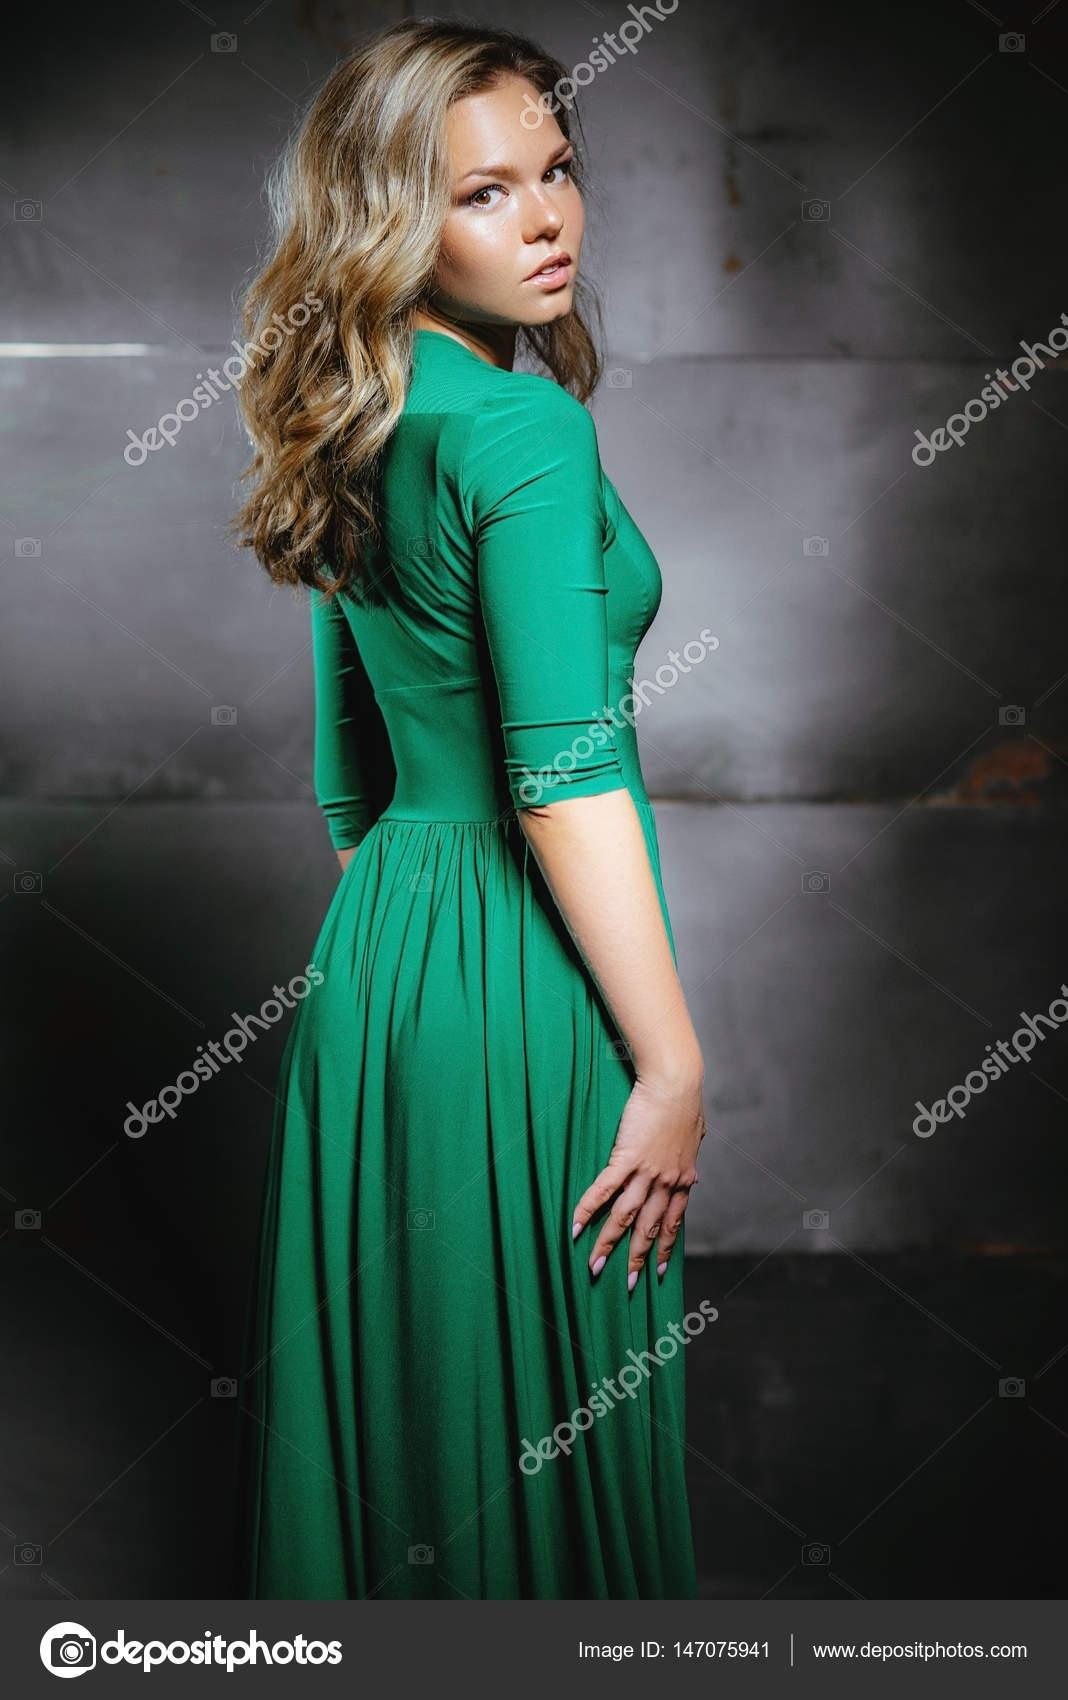 Formal Spektakulär Schönes Grünes Kleid Ärmel Einfach Schönes Grünes Kleid Boutique